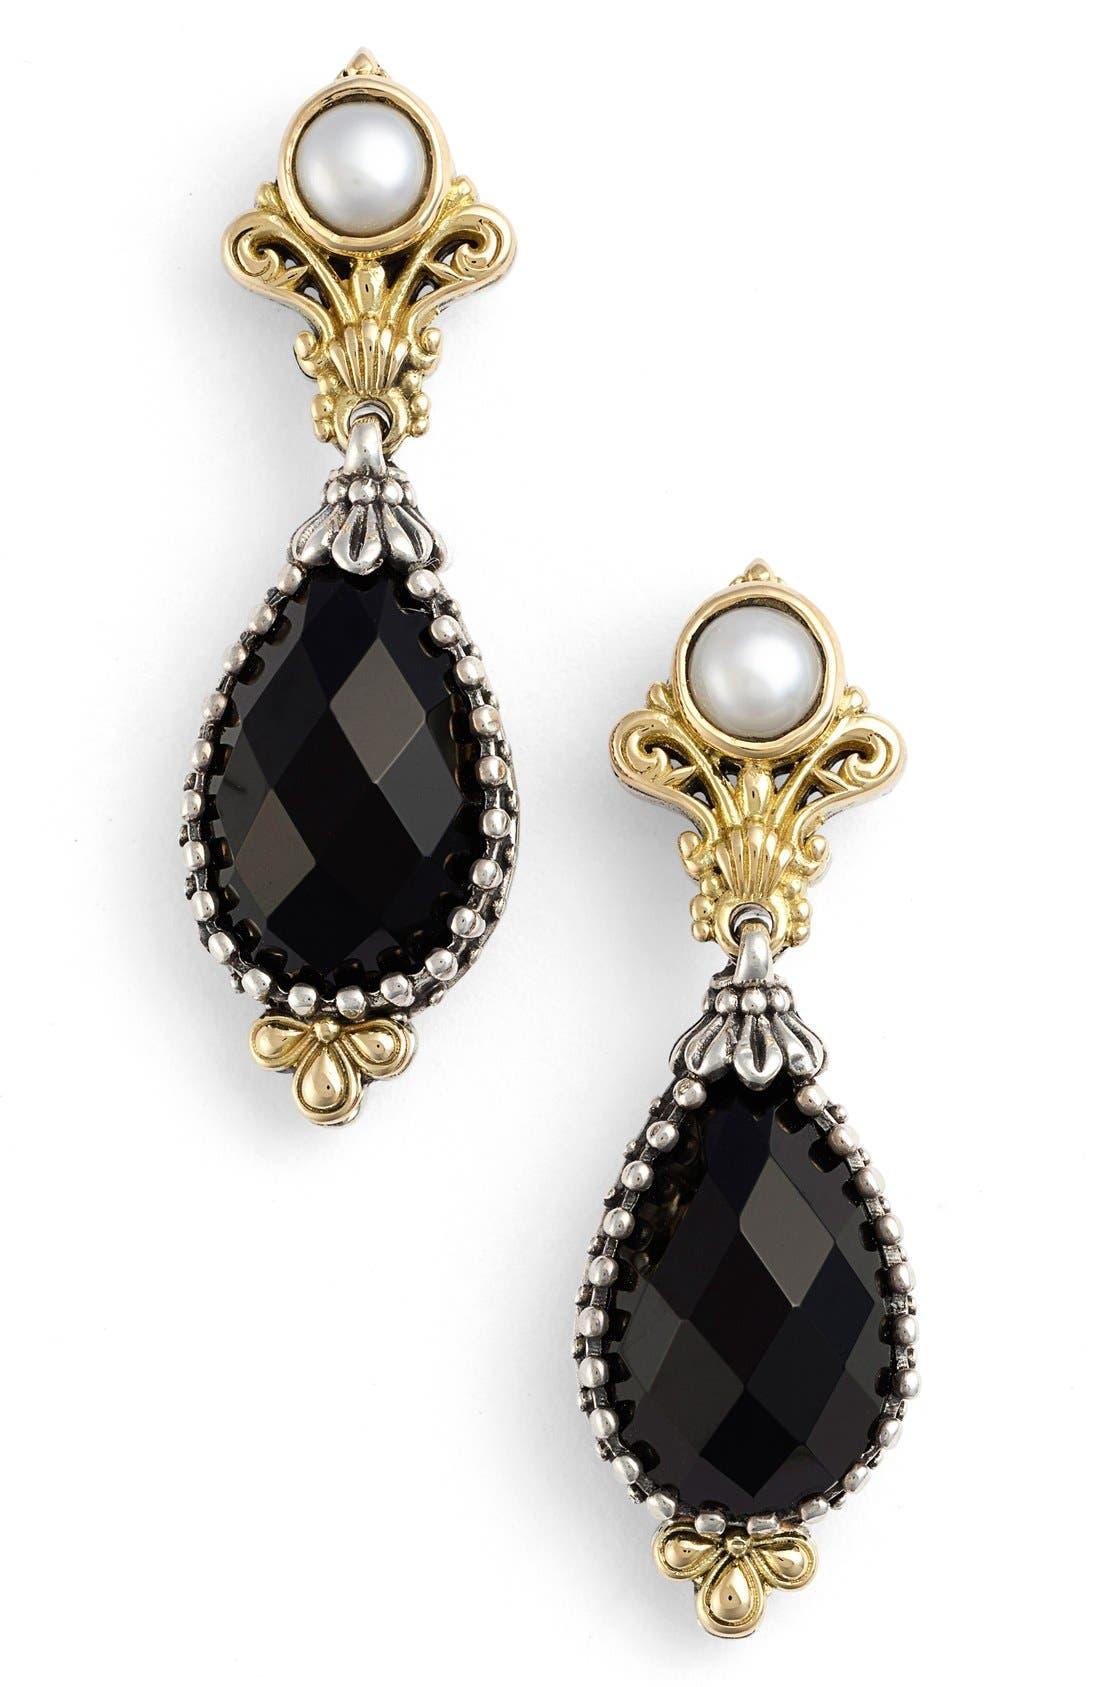 Main Image - Konstantino 'Nykta' Pearl & Black Onyx Drop Earrings